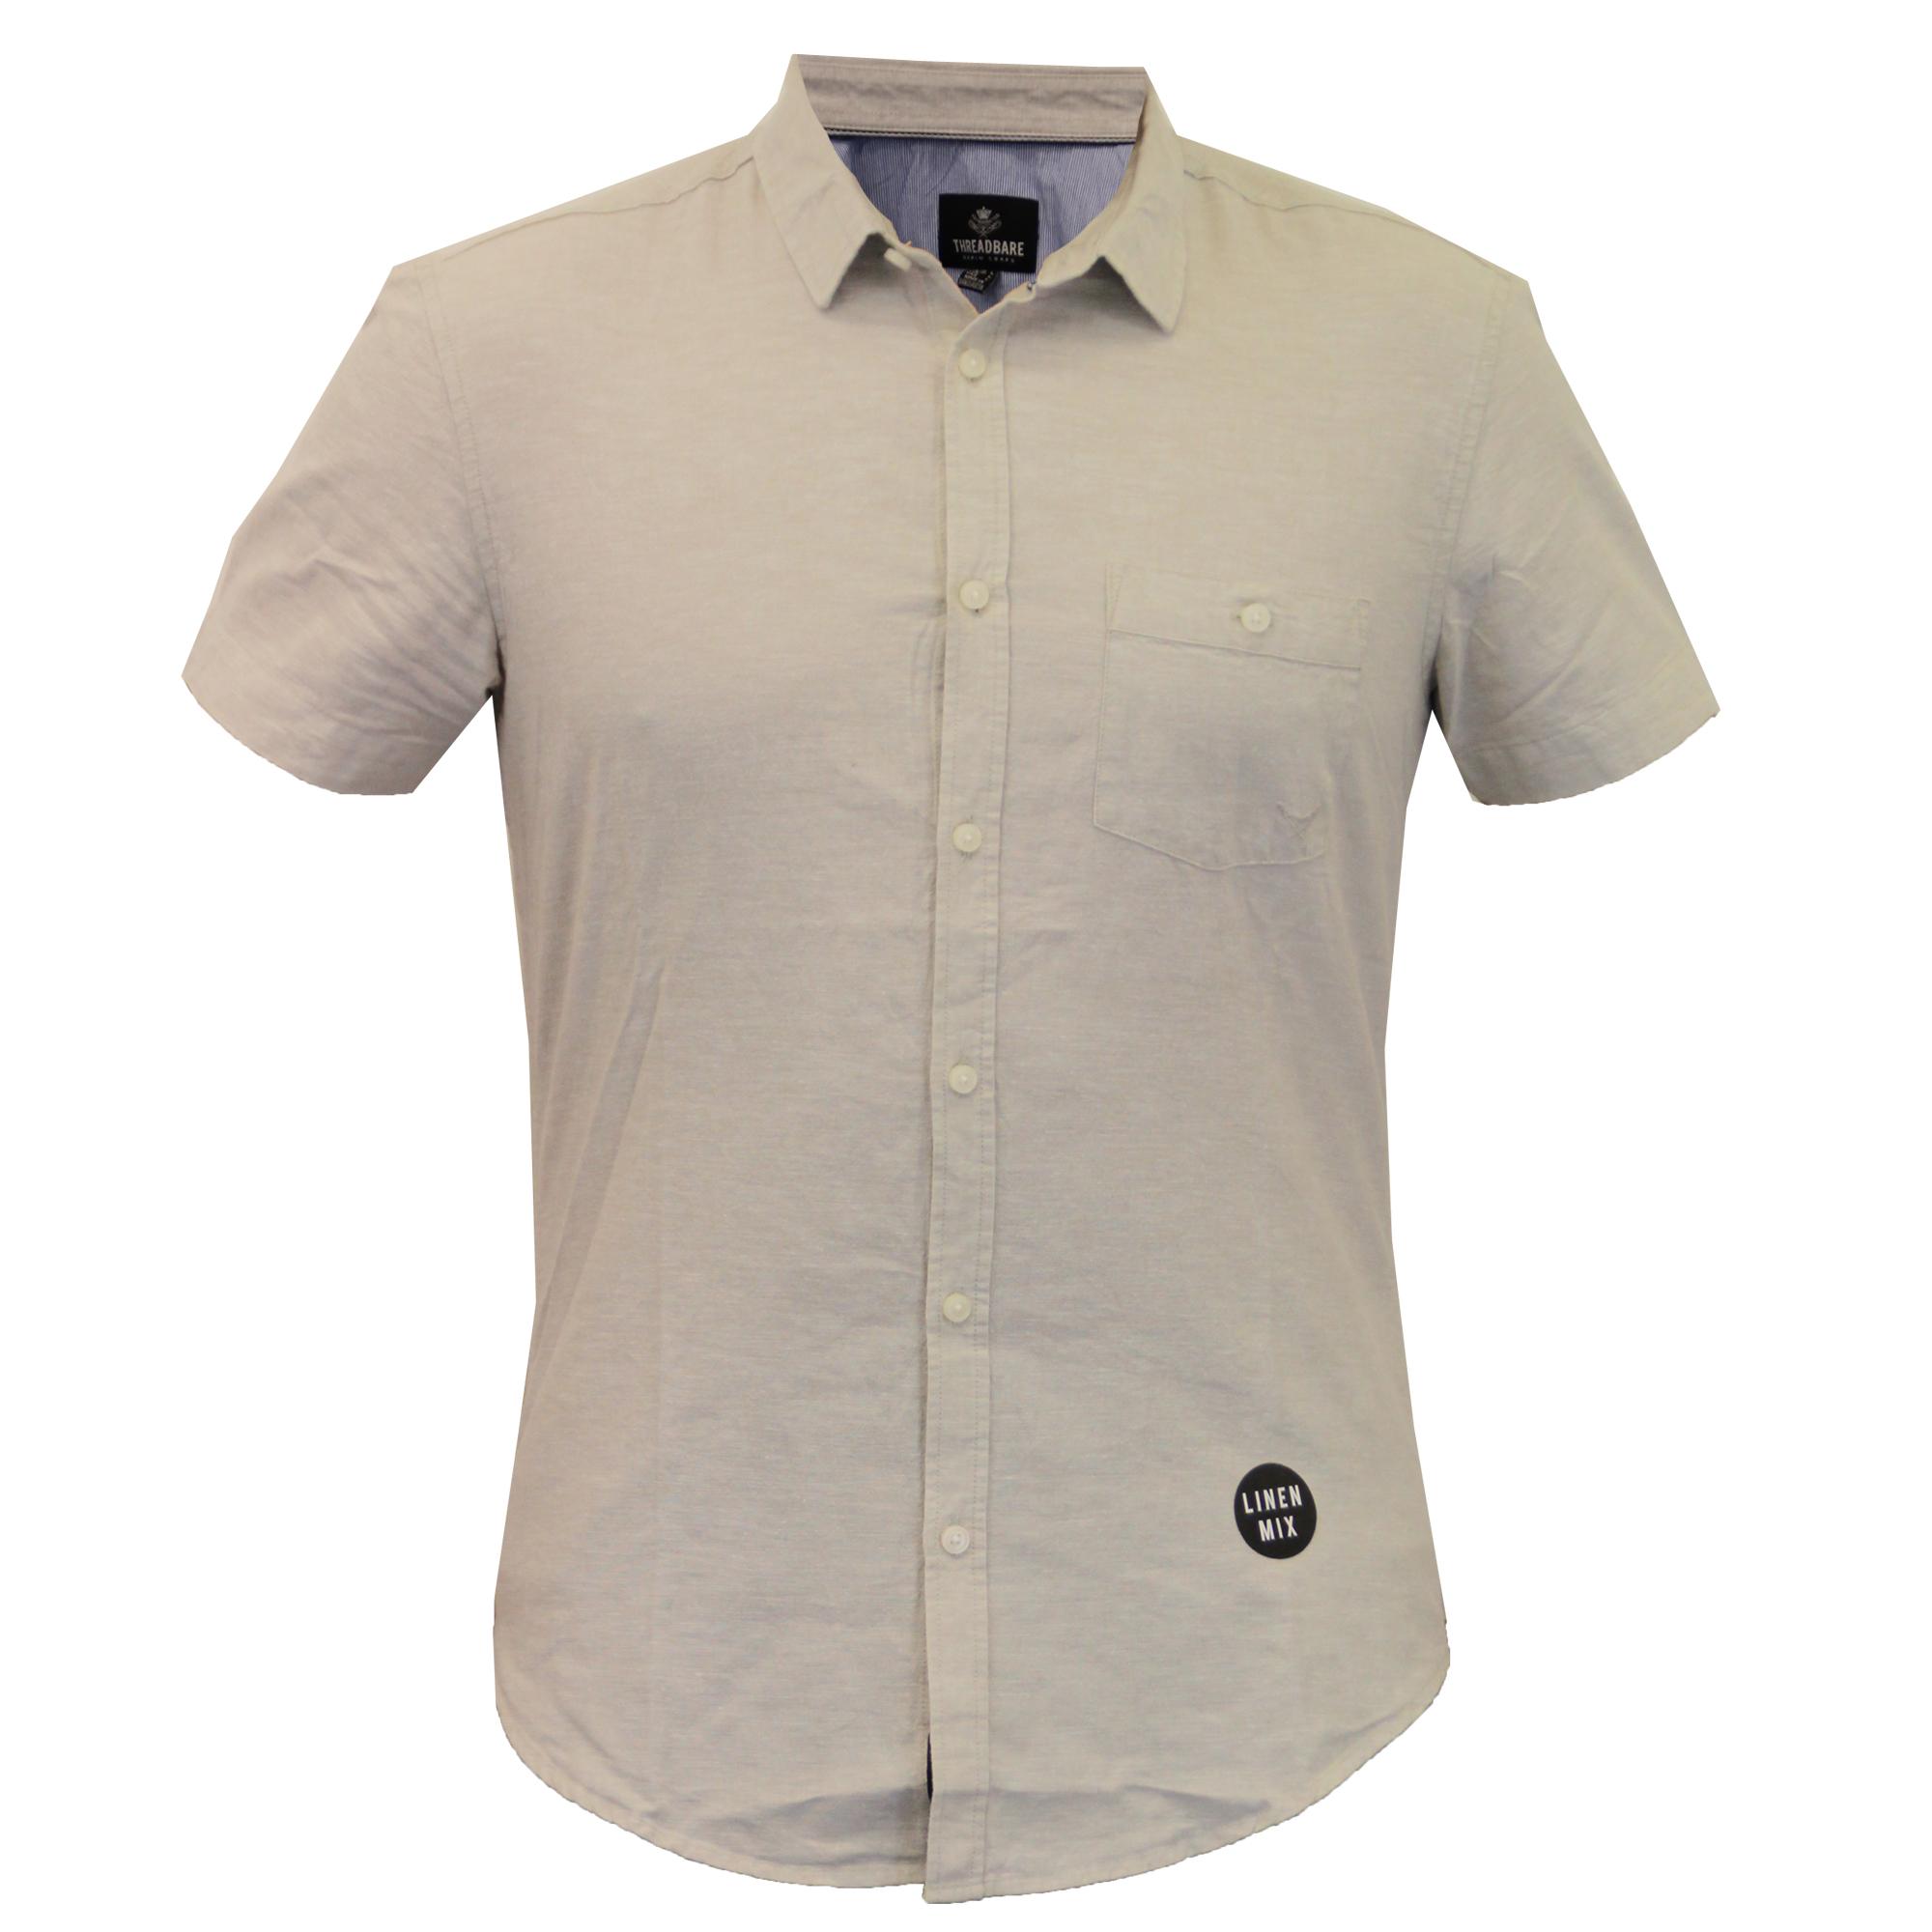 Mens-Linen-Shirt-Threadbare-Short-Sleeved-Brave-Soul-Collared-Casual-Summer-New thumbnail 22